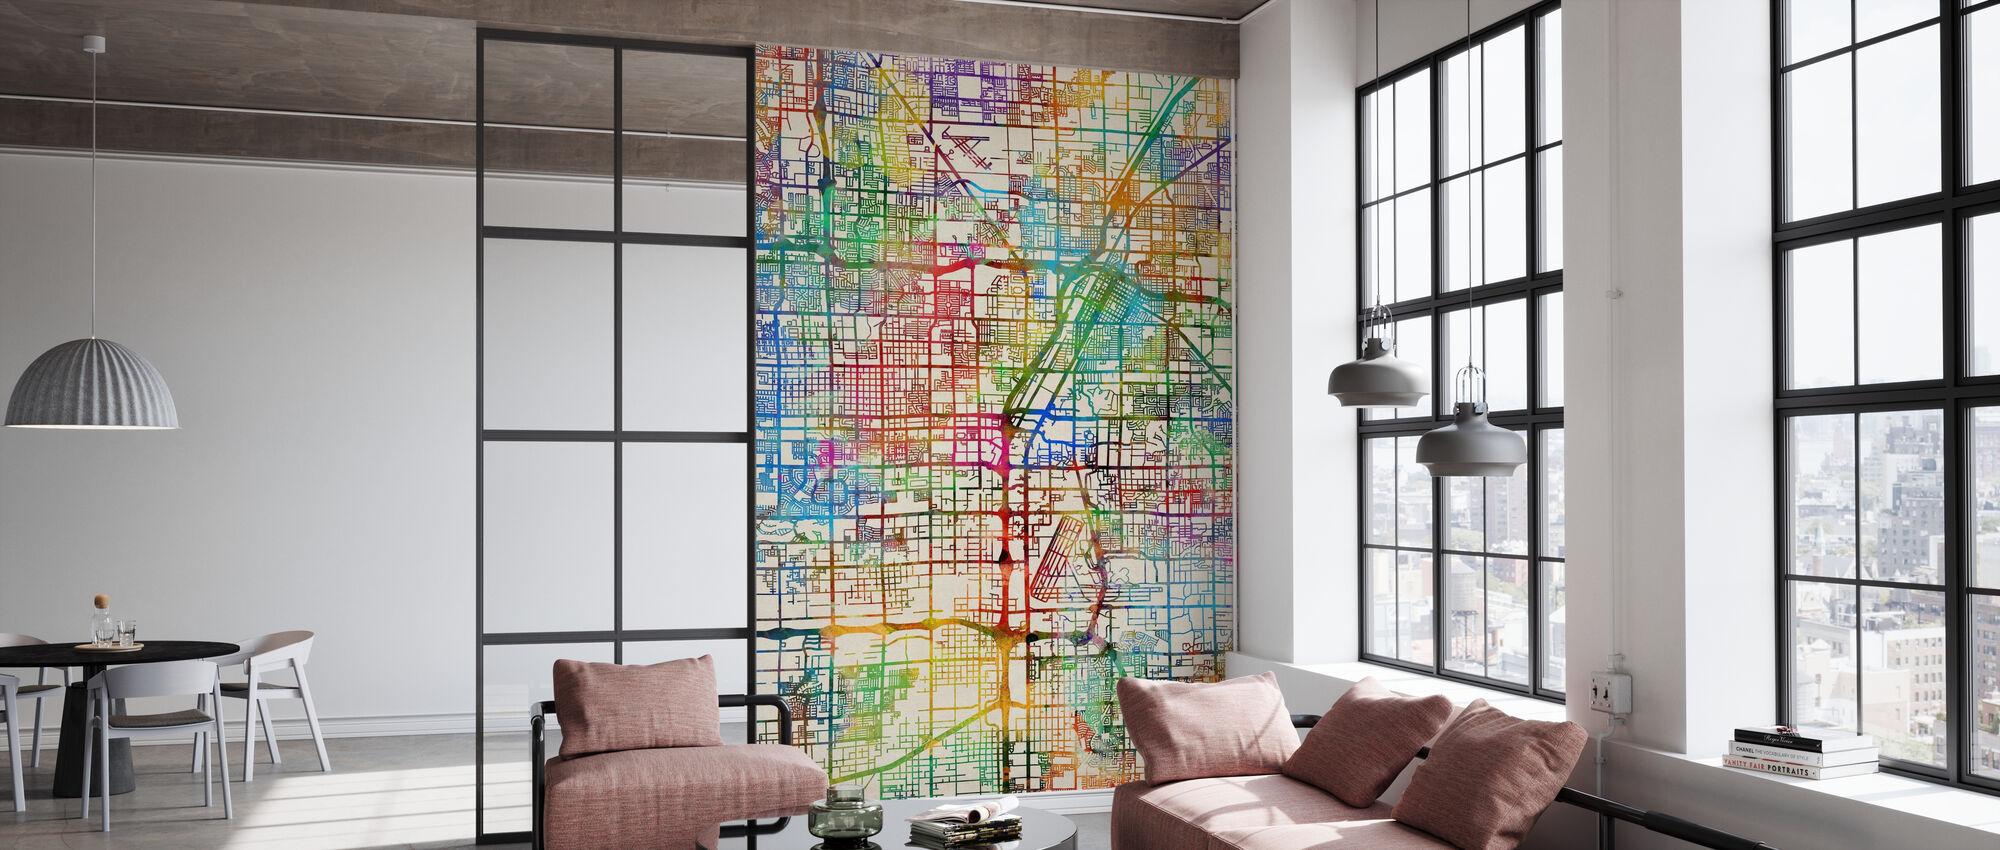 Las Vegas City Street Map - Wallpaper - Office